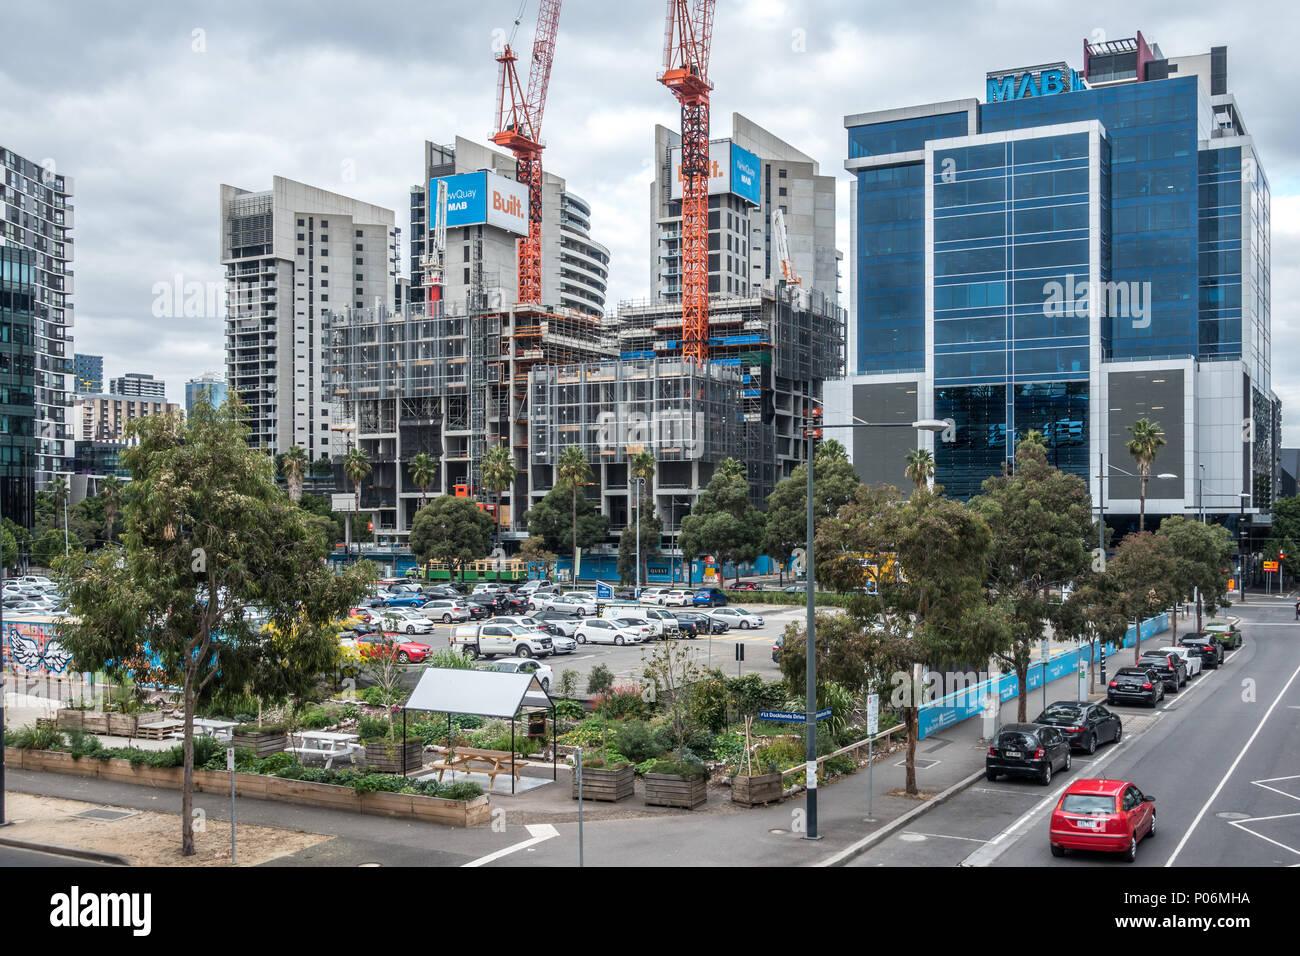 Community Gardens, public car park and modern buildings in Docklands. Melbourne, VIC Australia. - Stock Image